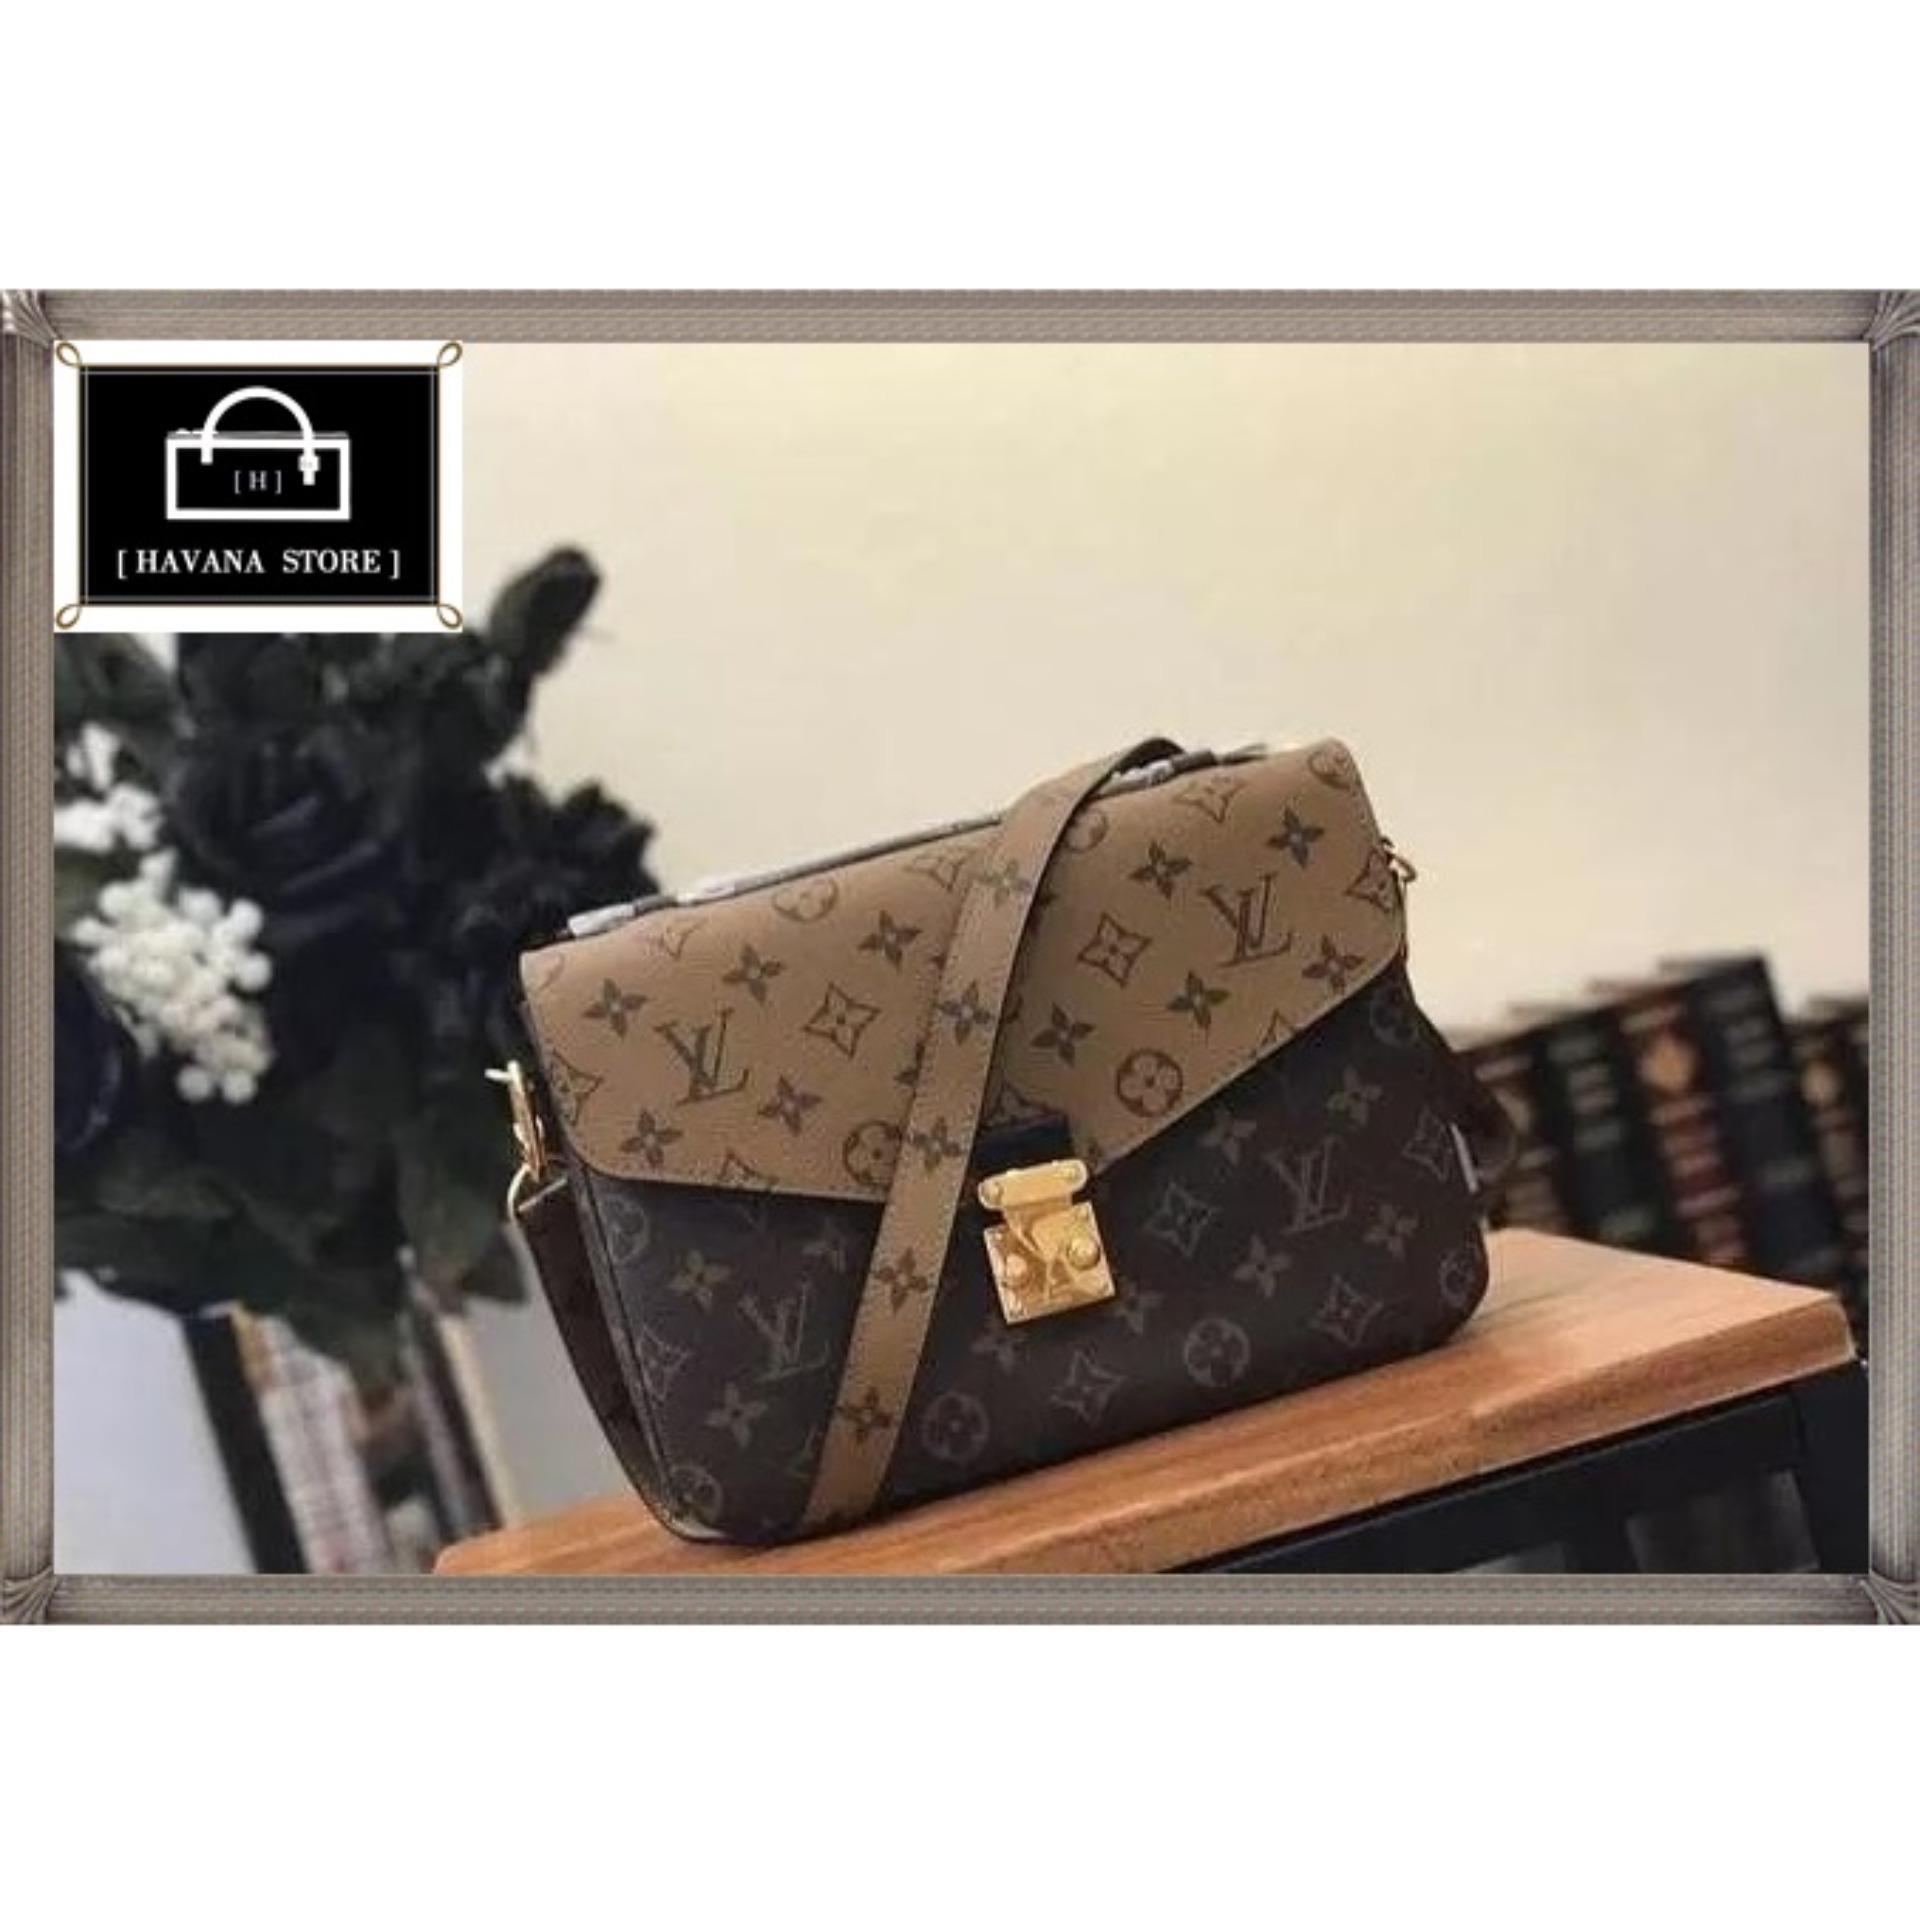 LOUIS VUITTON ( LV ) Metis Monogram Reverse Mirror Quality Tas Hand Bag Wanita Branded  ; Tas branded ; Tas branded bersertifikat ;  Tas import ; Chanel ; Gucci ; Zara ; LOUIS VUITTON ( LV ) ; Hermes ; Fossil ; Dior ; Tas wanita ; Fashion wanita